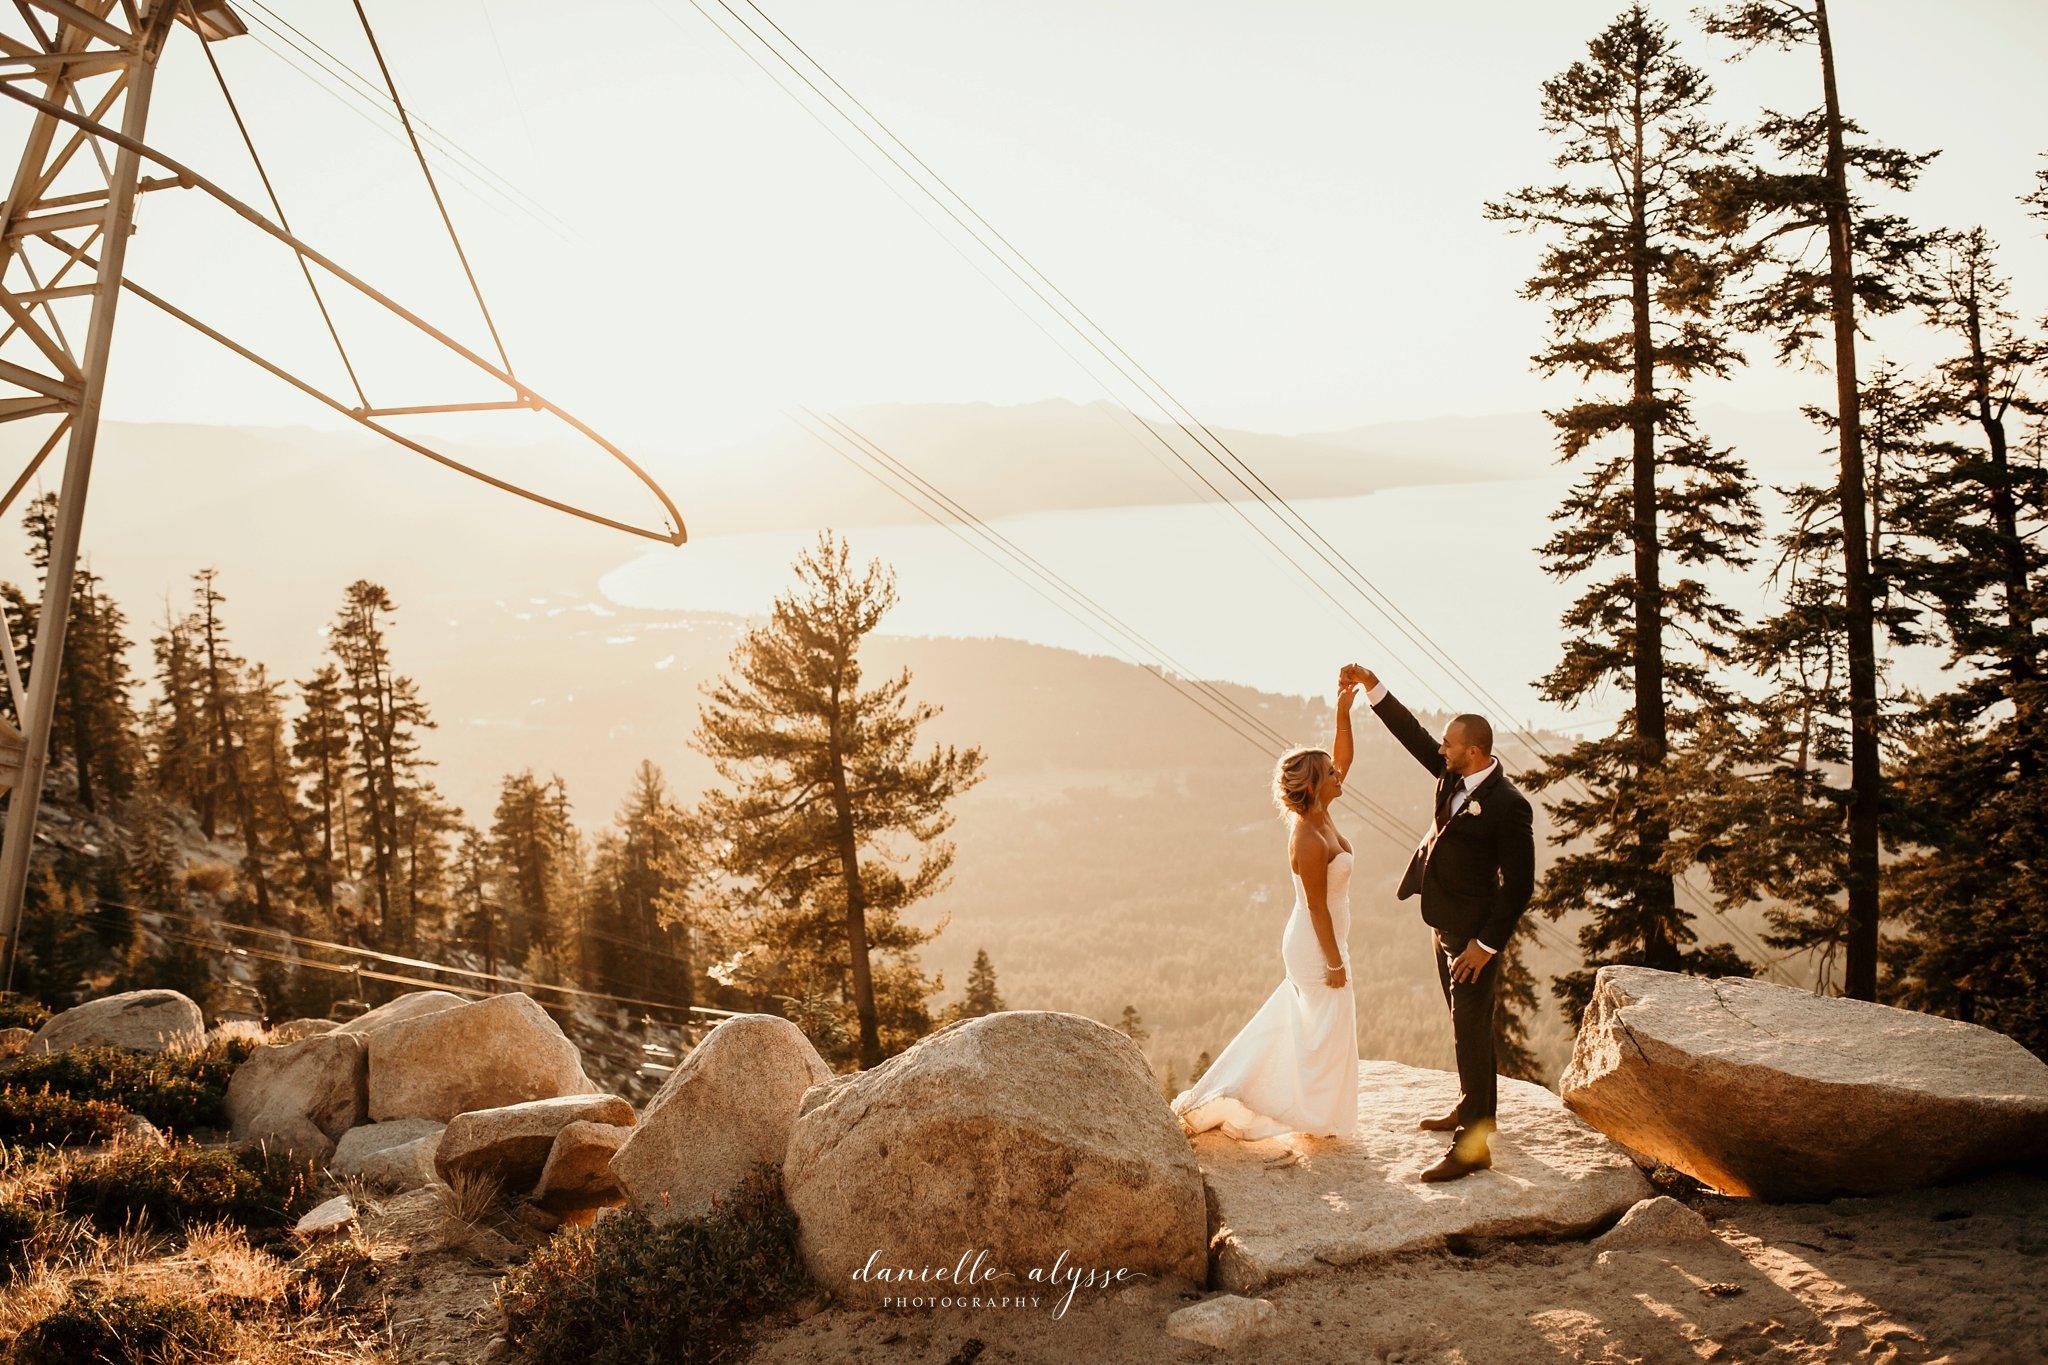 180831_wedding_stephanie_heavenly_south_lake_tahoe_danielle_alysse_photography_destination_blog_998_WEB.jpg